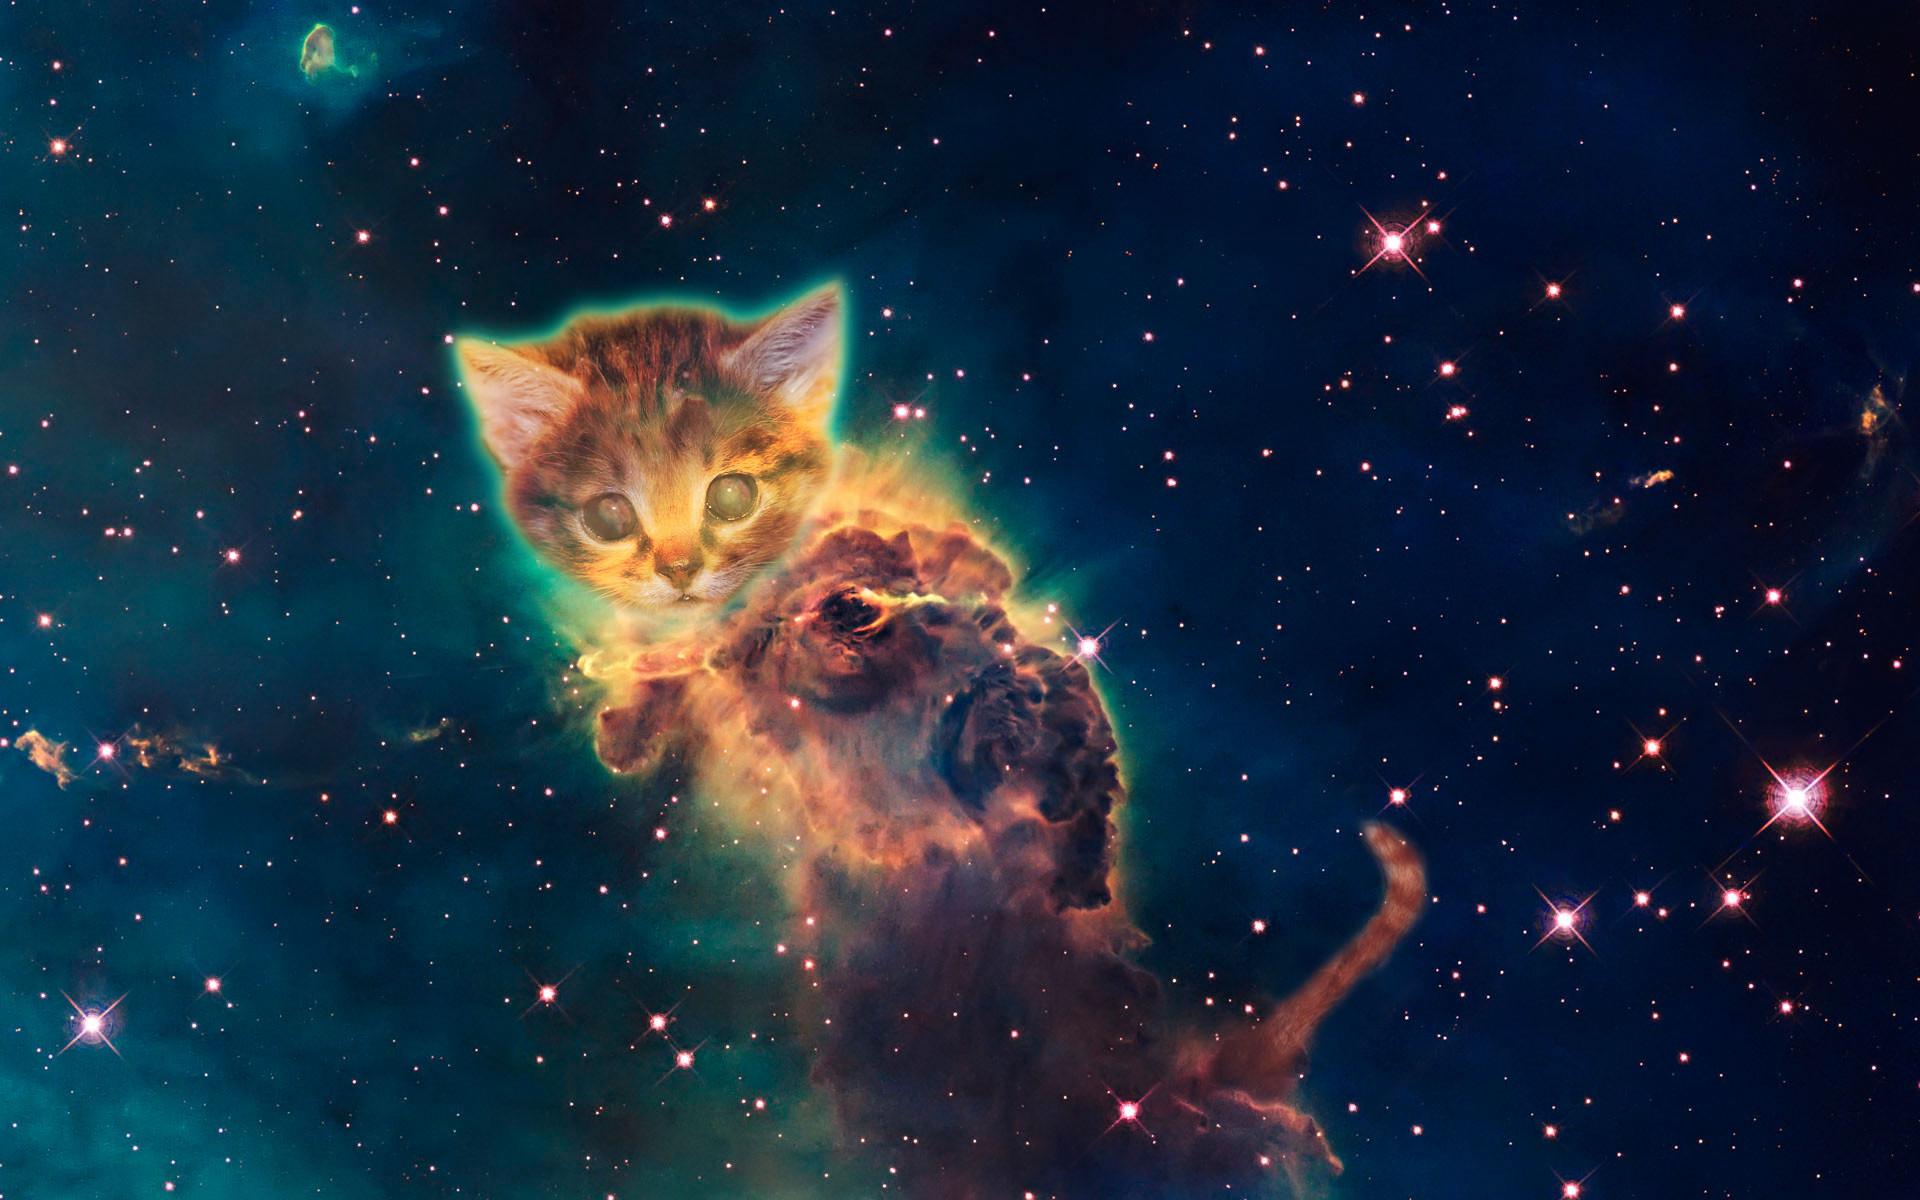 Galaxy Cat Wallpaper – Bing images